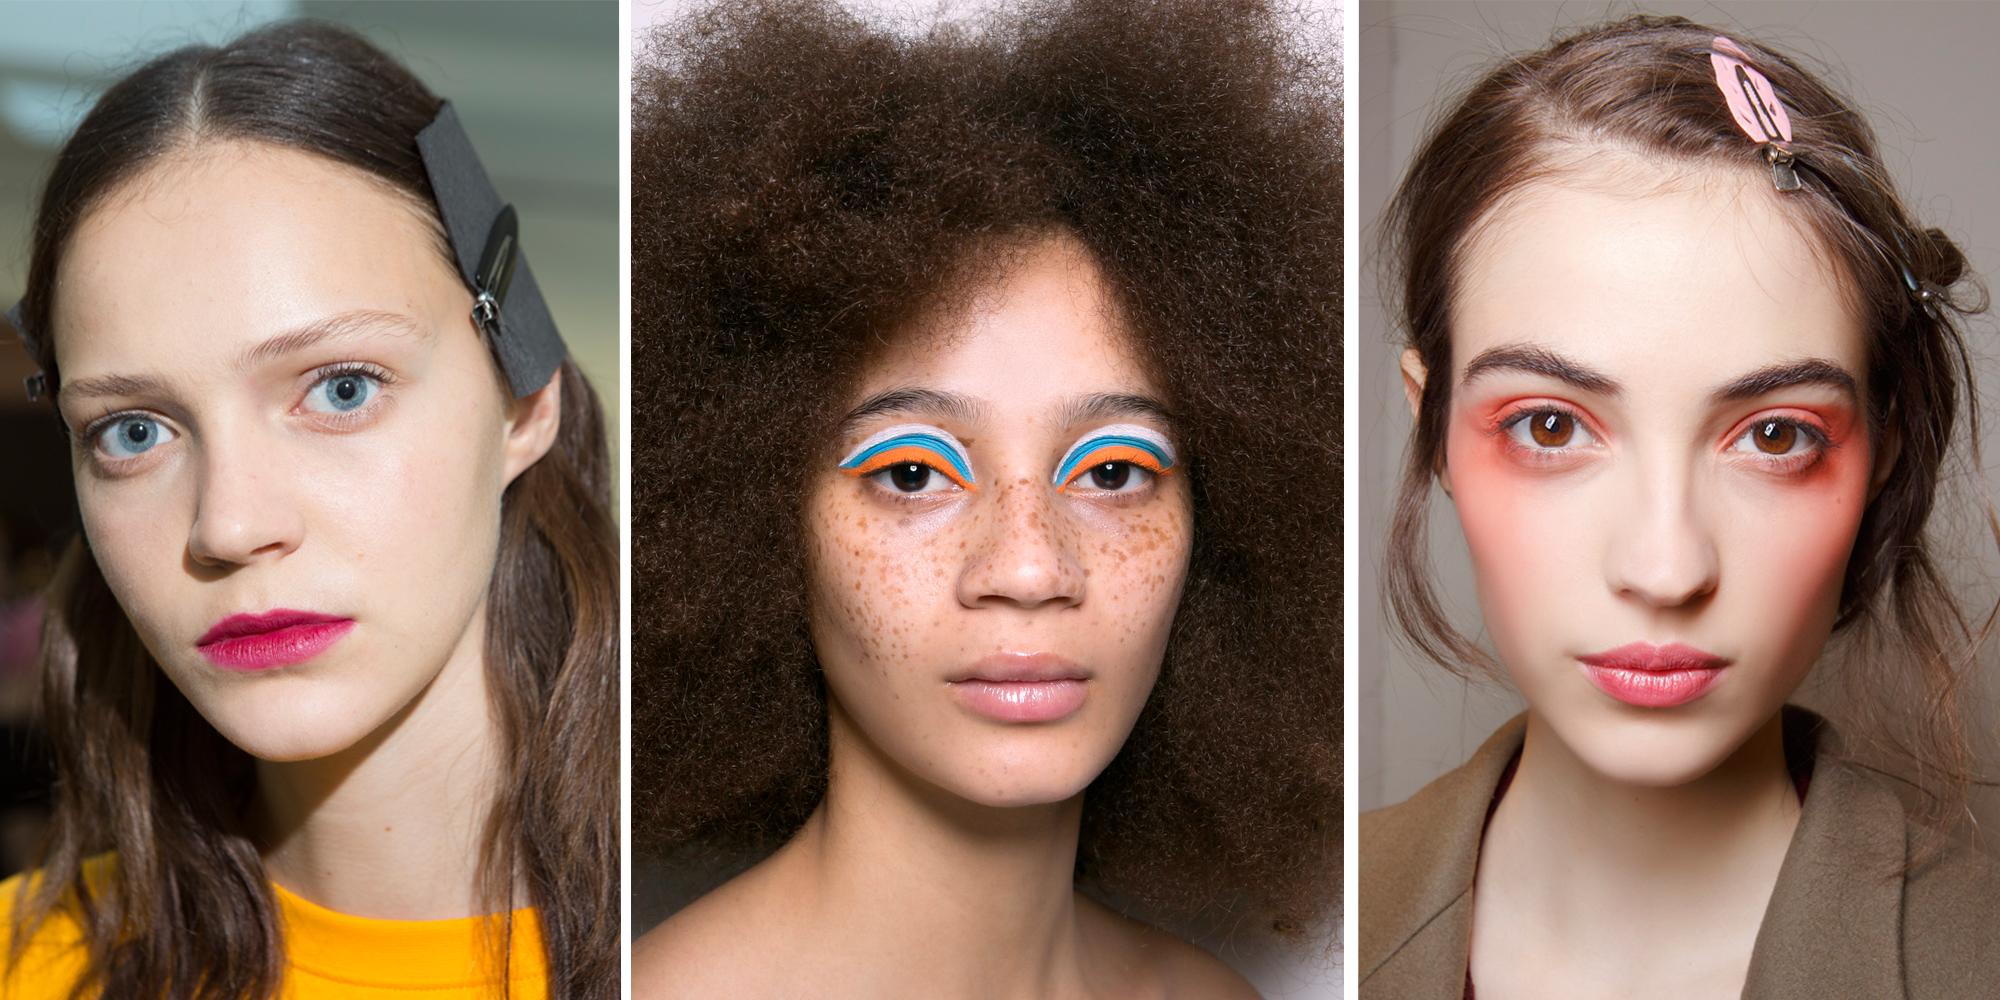 makeup trends 2018 lipstick eyeshadow and makeup ideas